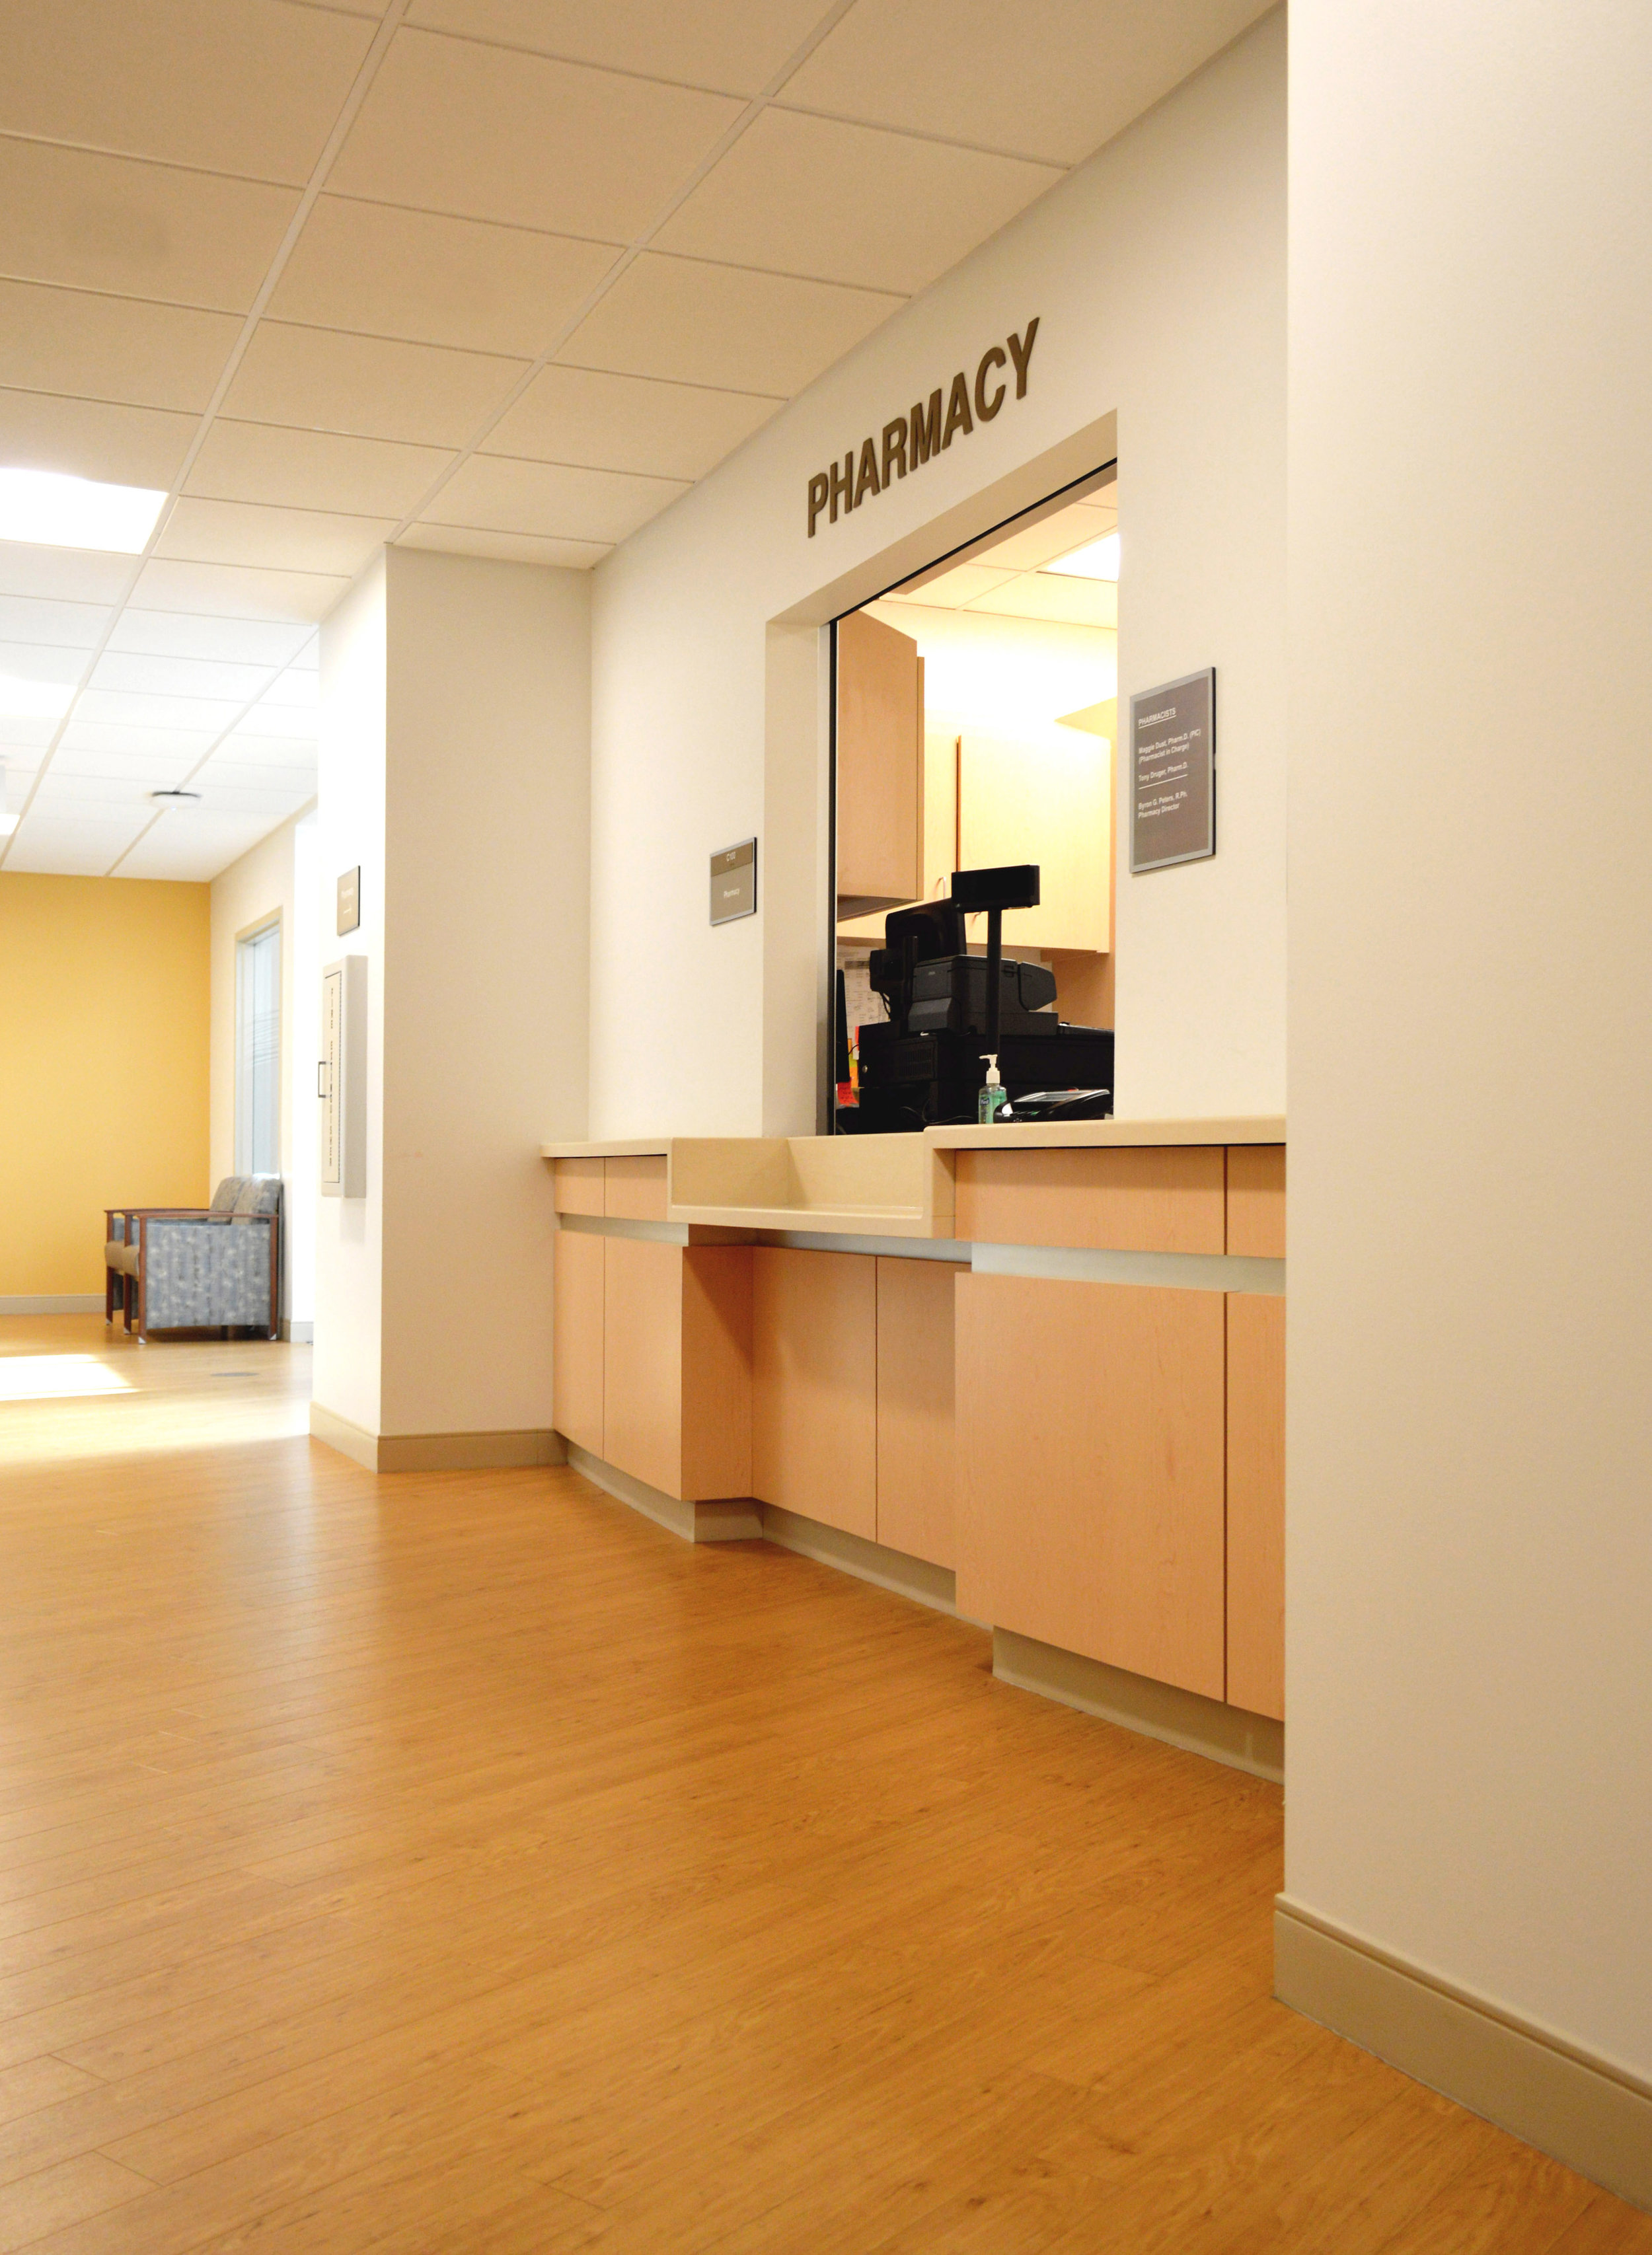 Siteman_Cancer_Center (8).JPG